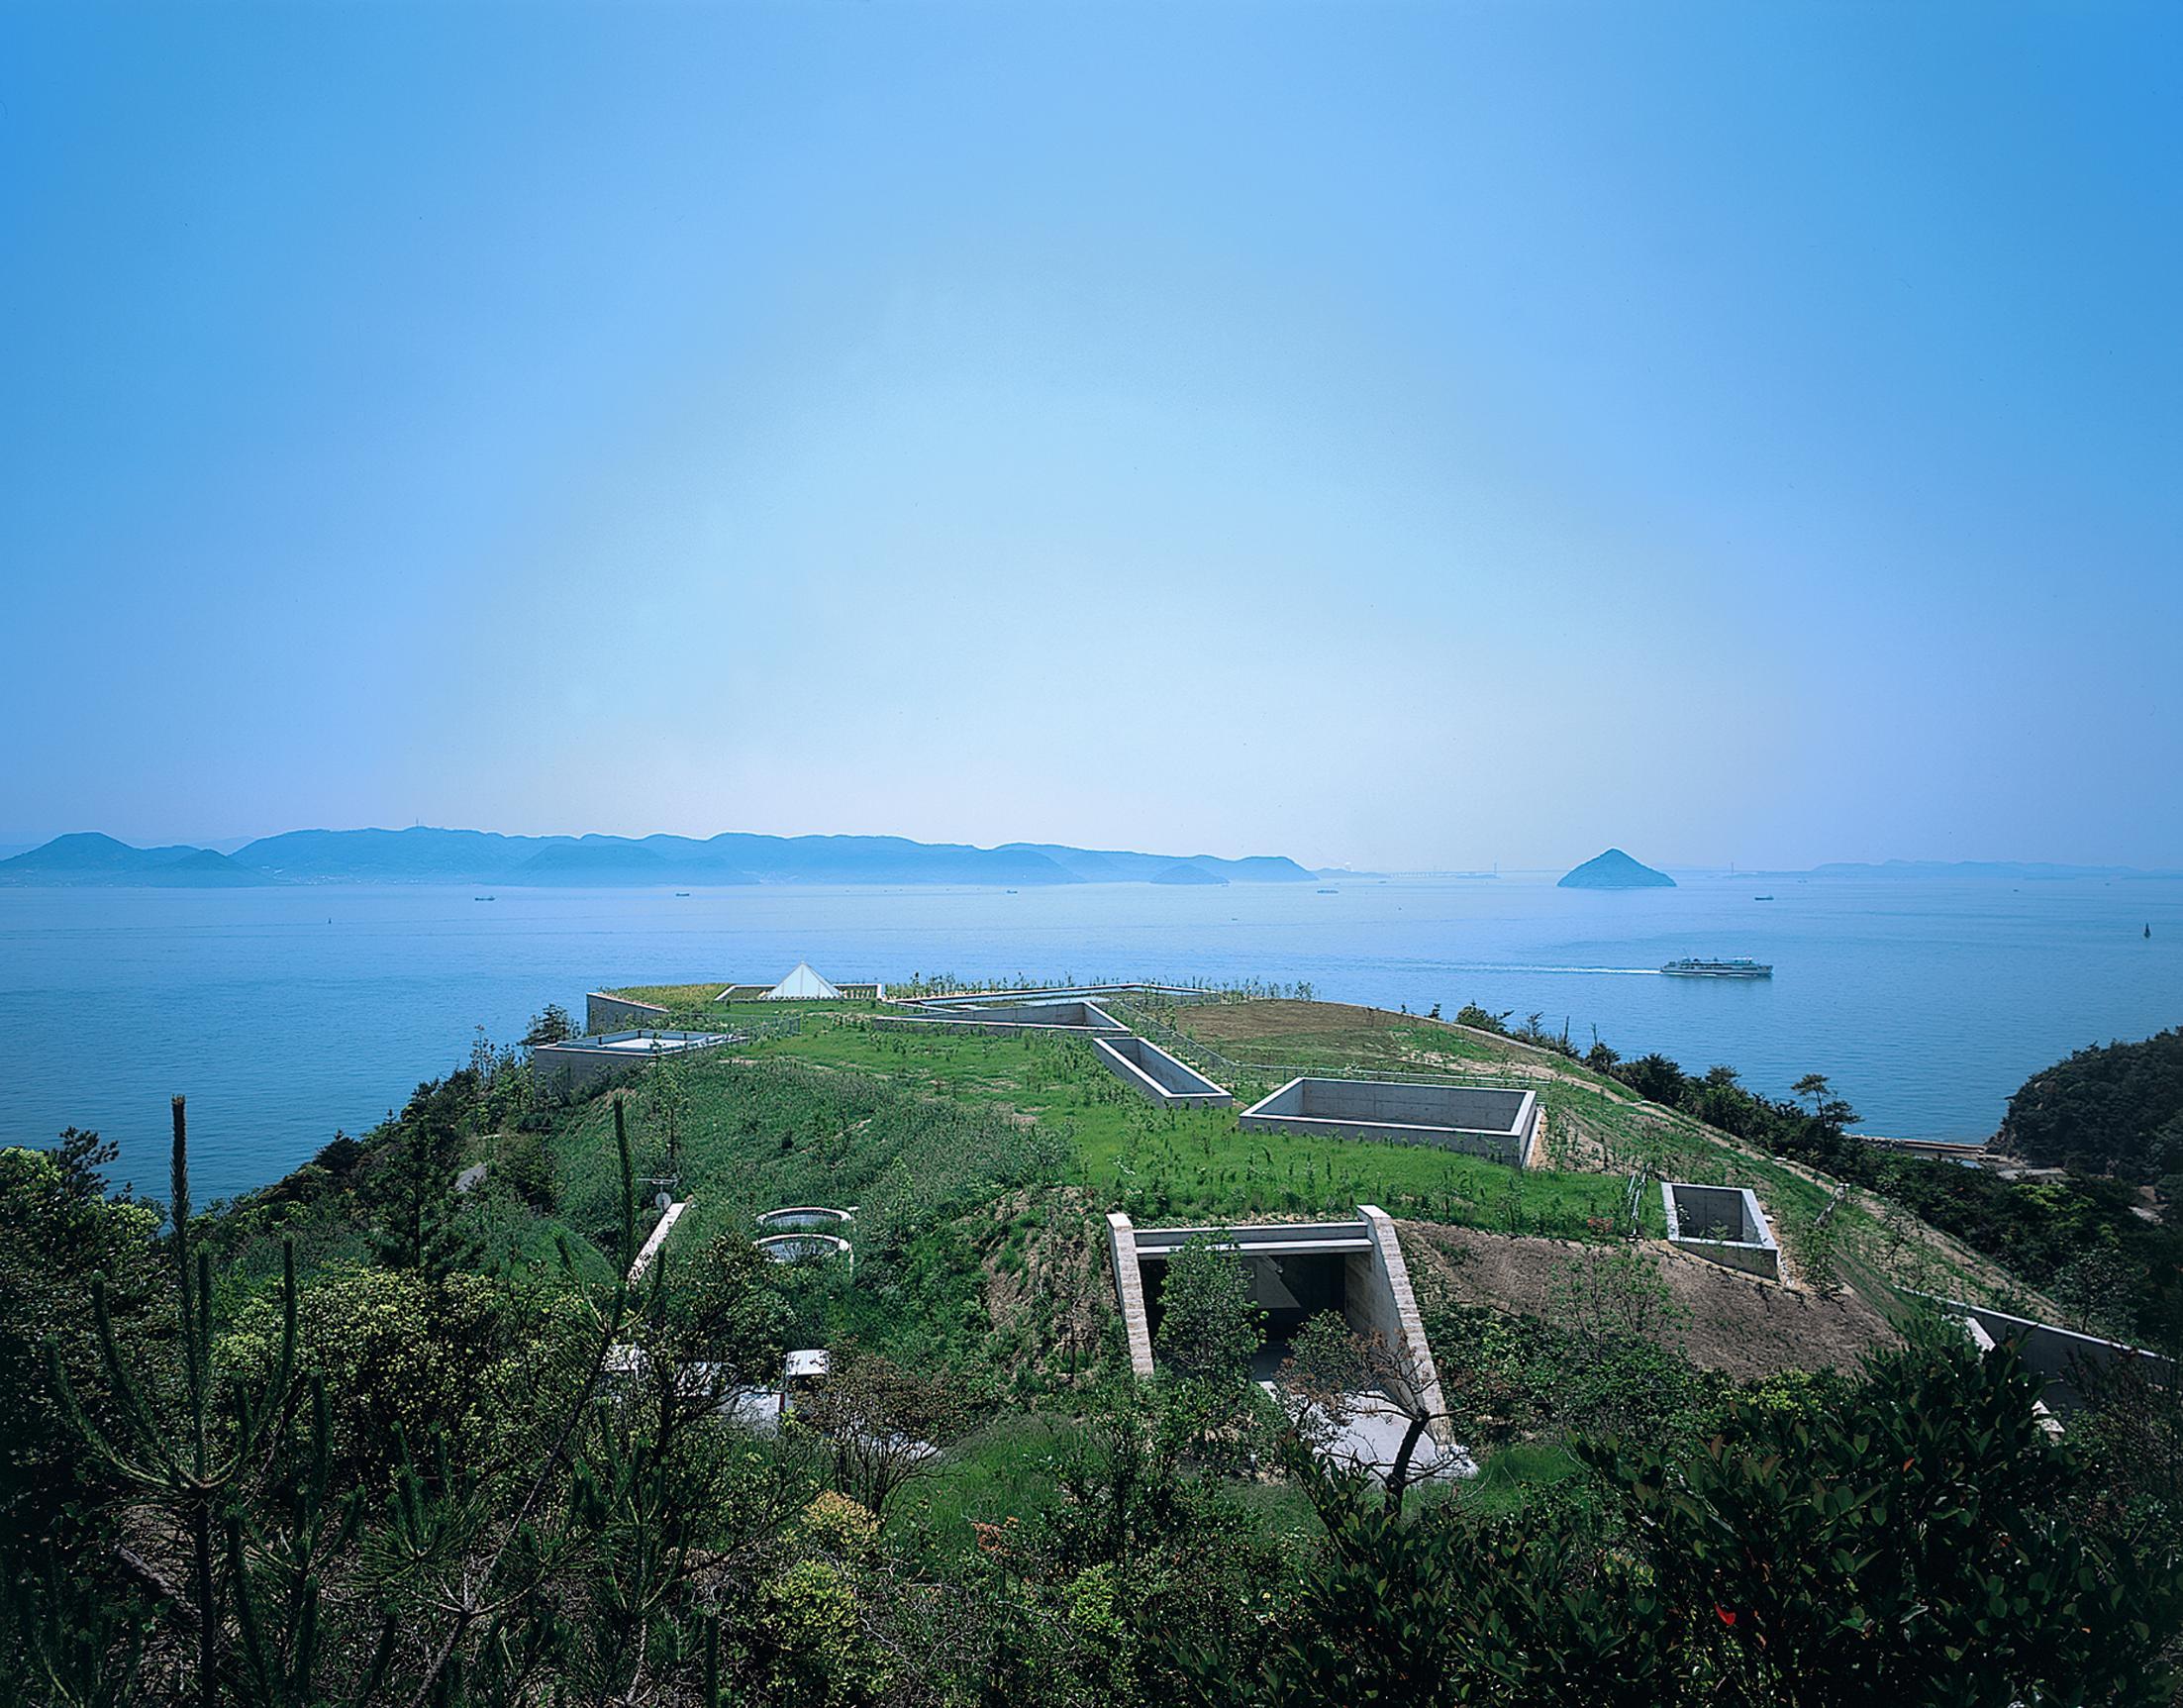 Chichu Art Museum, Architect: Tadao Ando, Photographer: Mitsumasa Fujitsuka